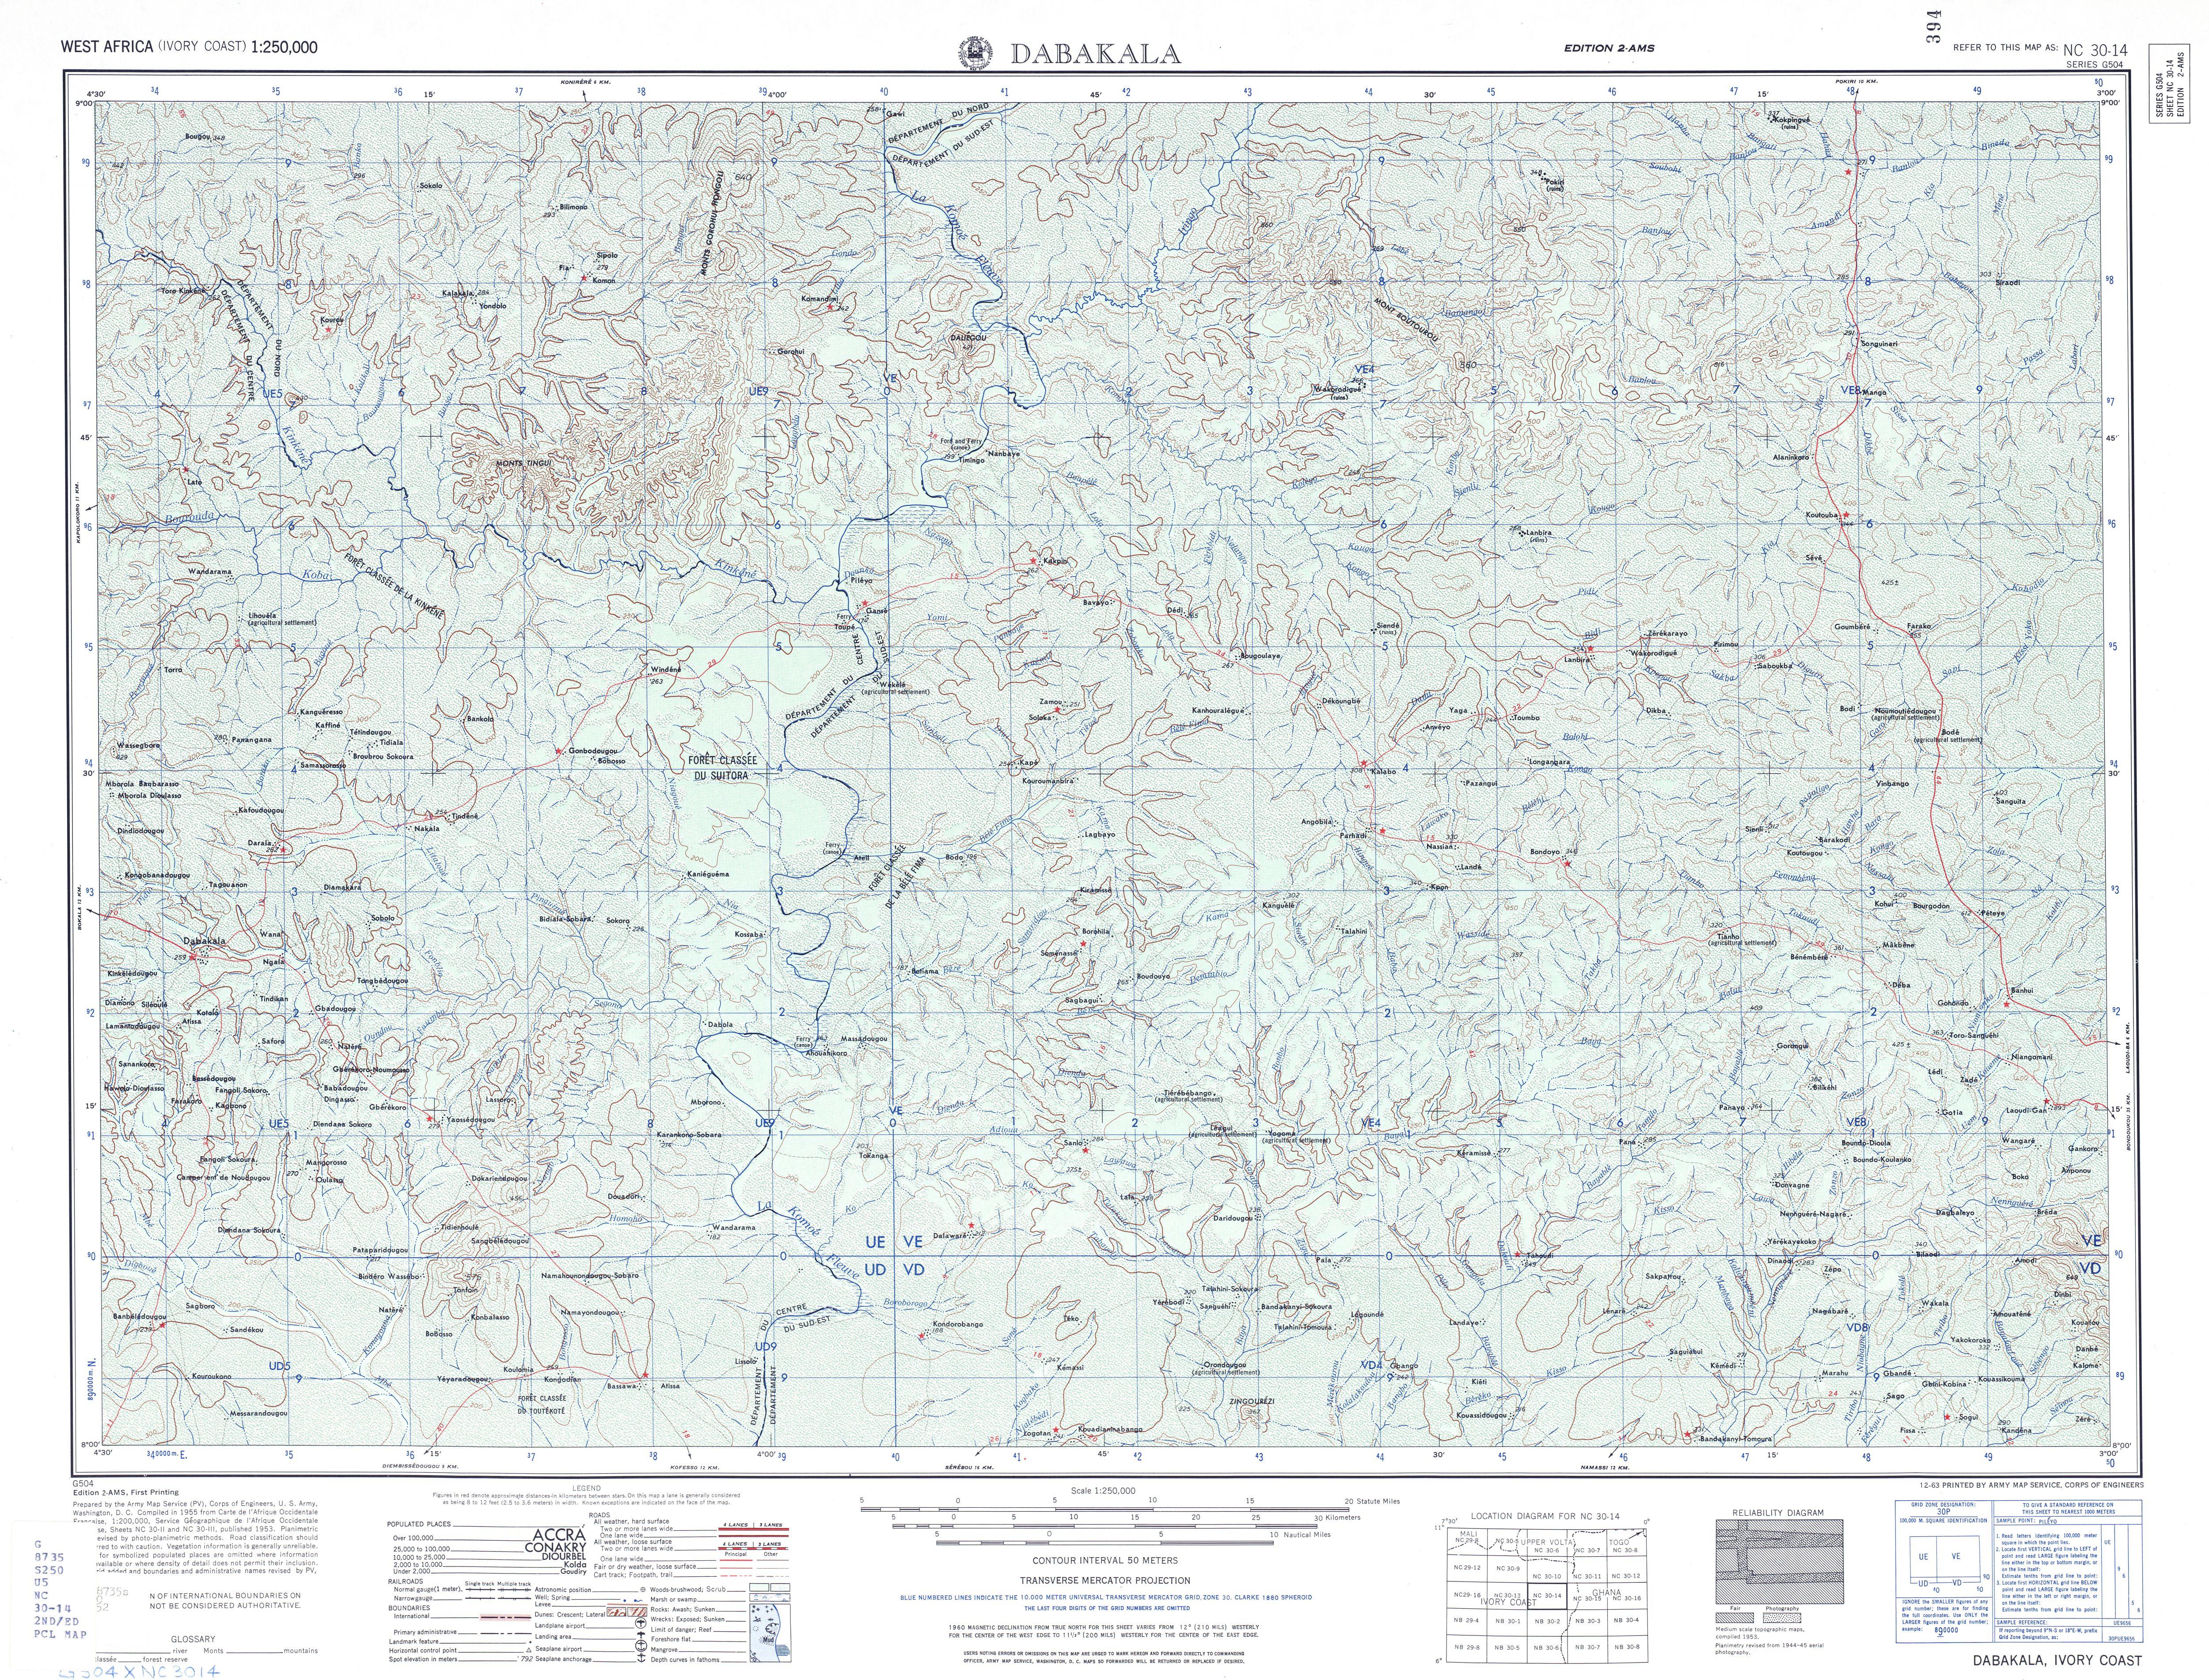 Hoja Dabakala del Mapa Topográfico de África Occidental 1955